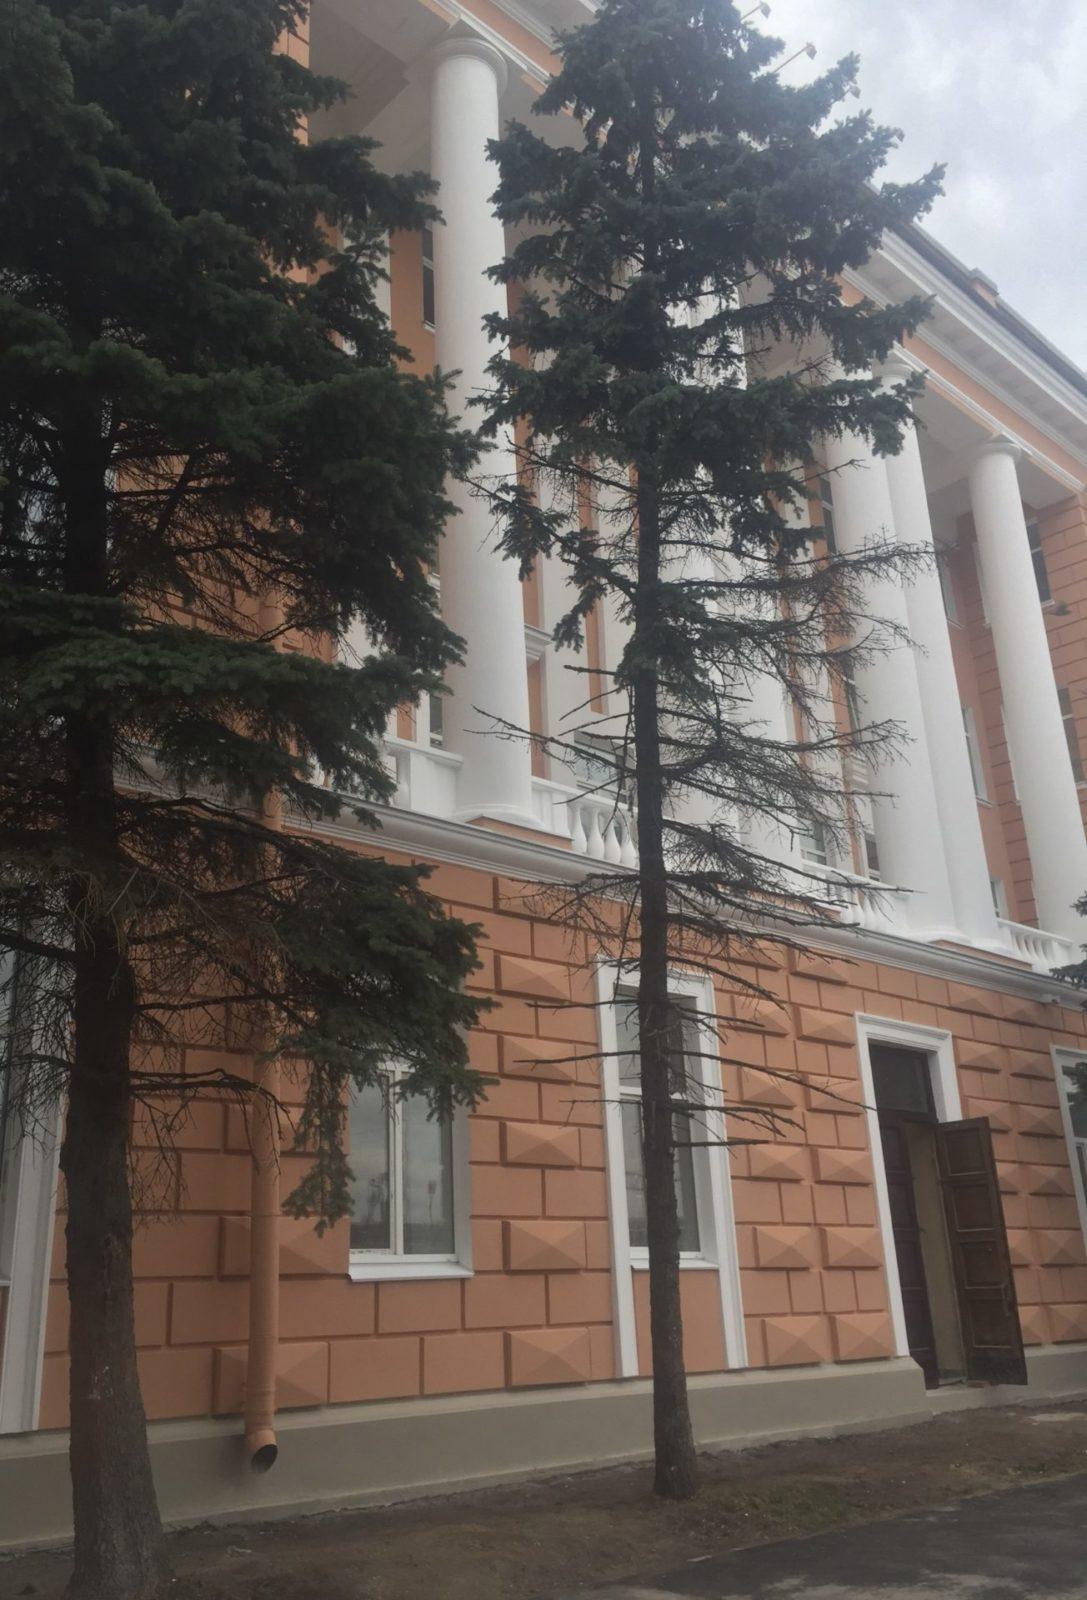 Проведен ремонт фасада здания на ул. Набережная Обводного канала, д.14 в СПб